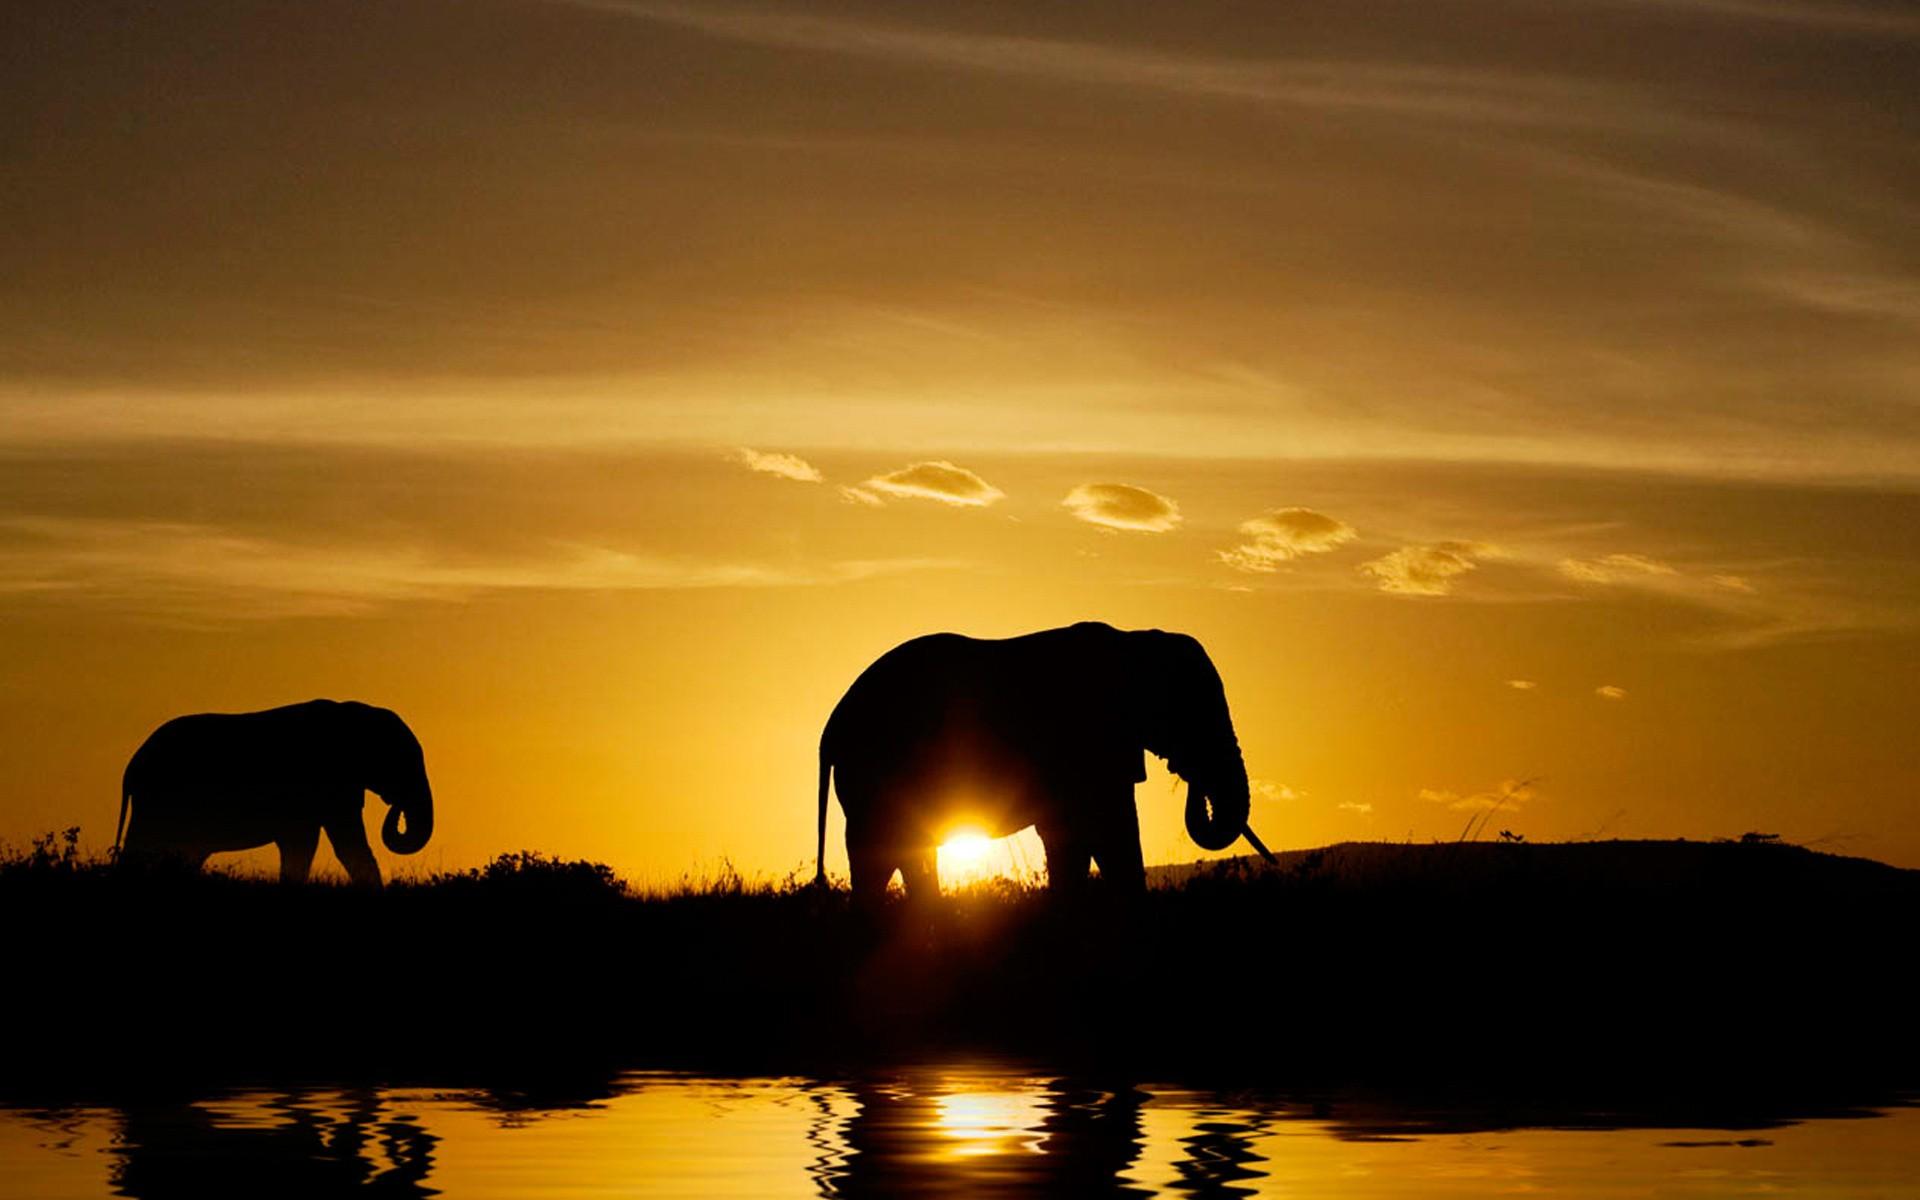 Elefantes en atardecer - 1920x1200